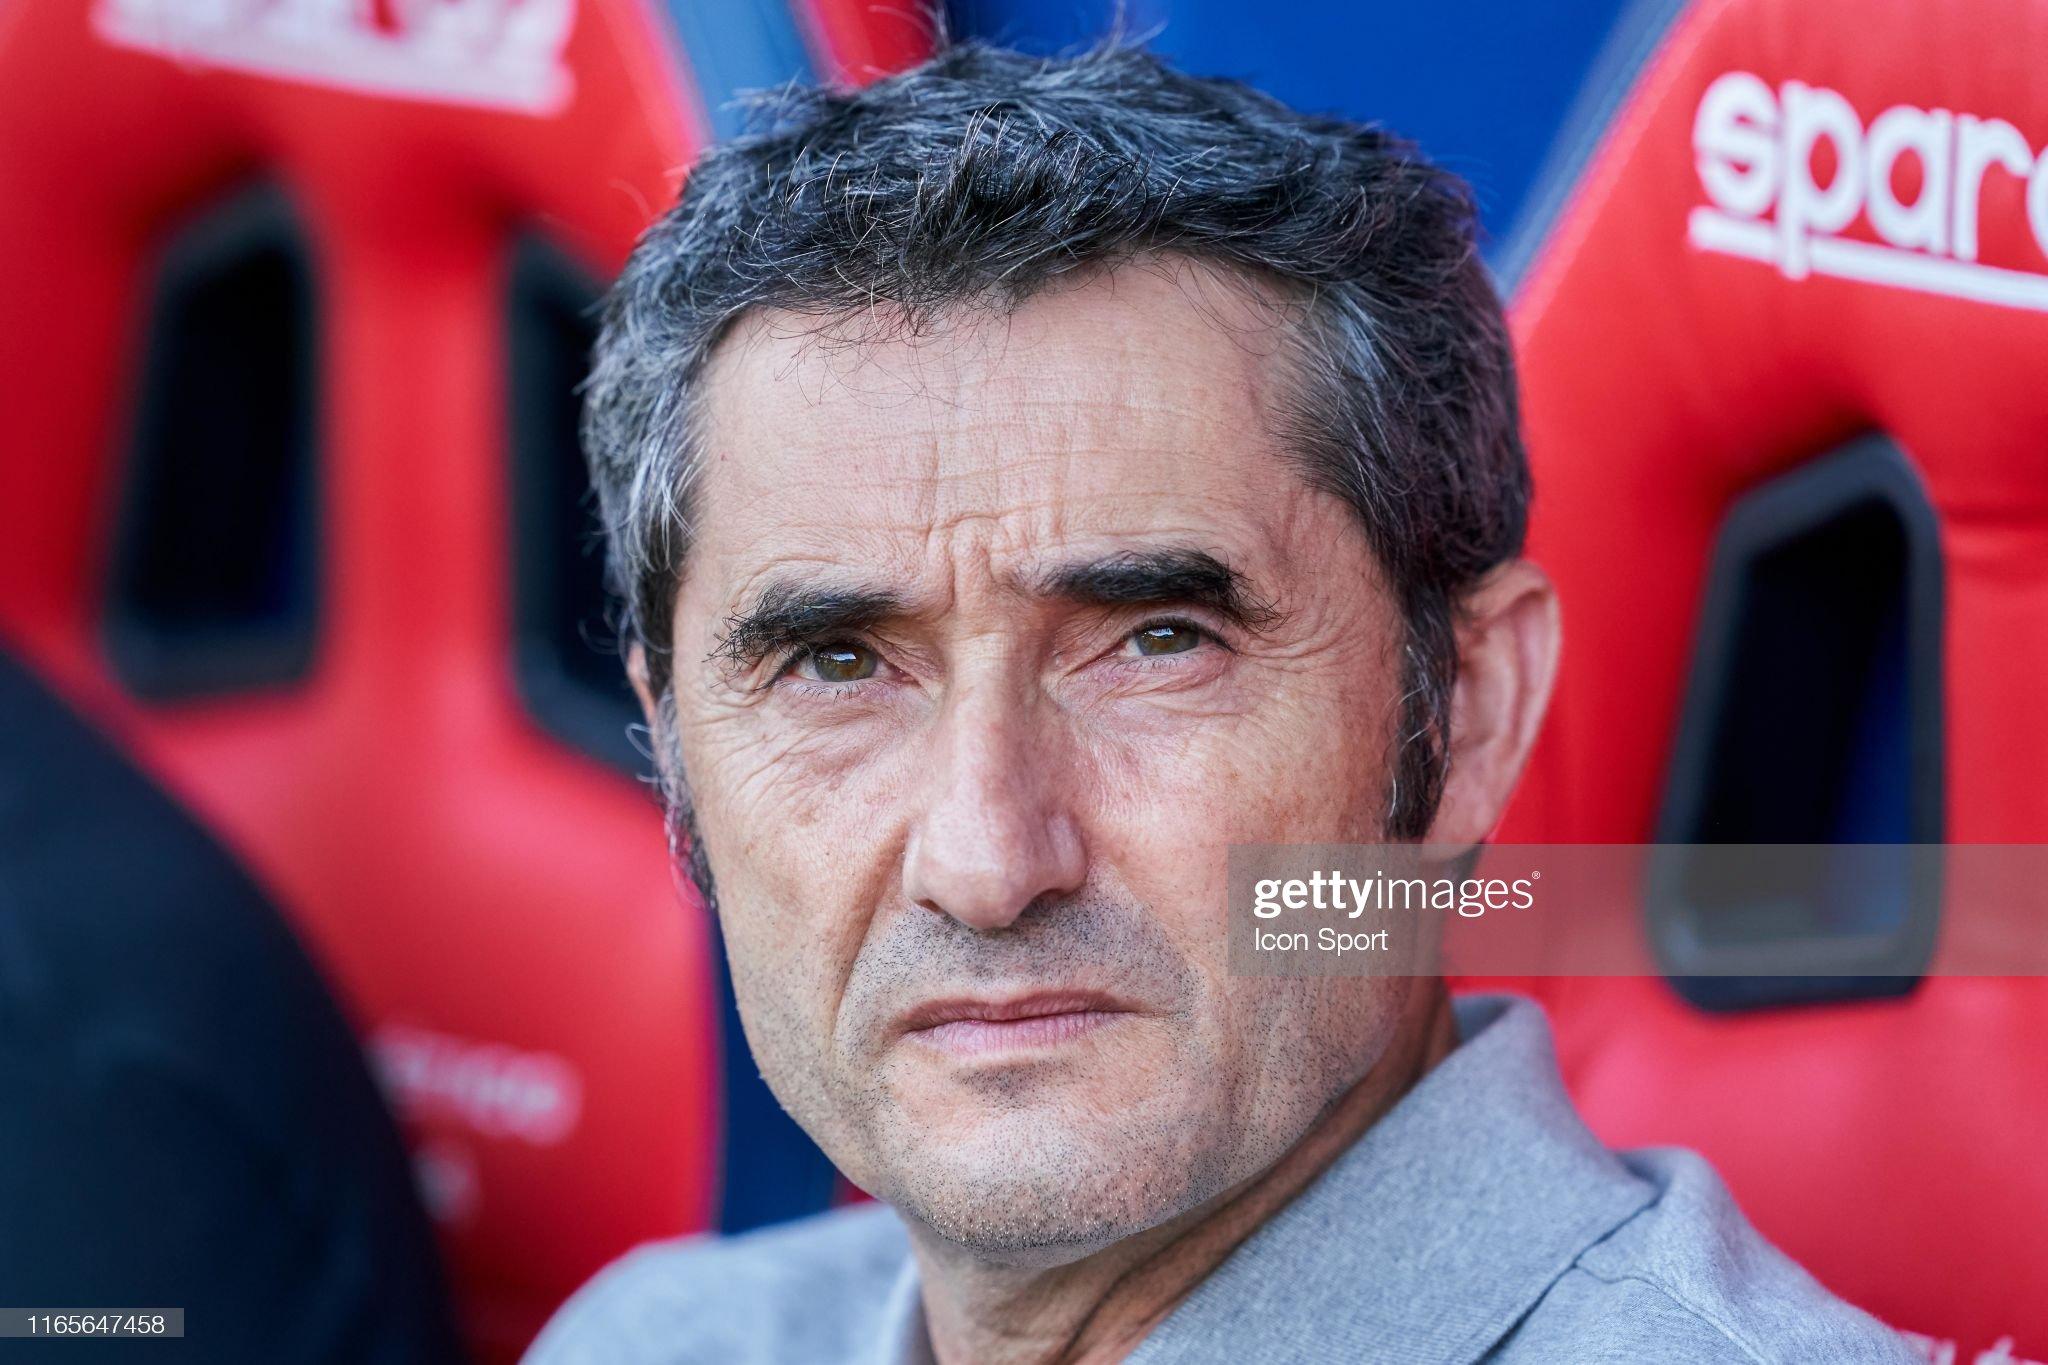 صور مباراة : أوساسونا - برشلونة 2-2 ( 31-08-2019 )  Coach-ernesto-valverde-of-fc-barcelona-during-the-liga-match-between-picture-id1165647458?s=2048x2048